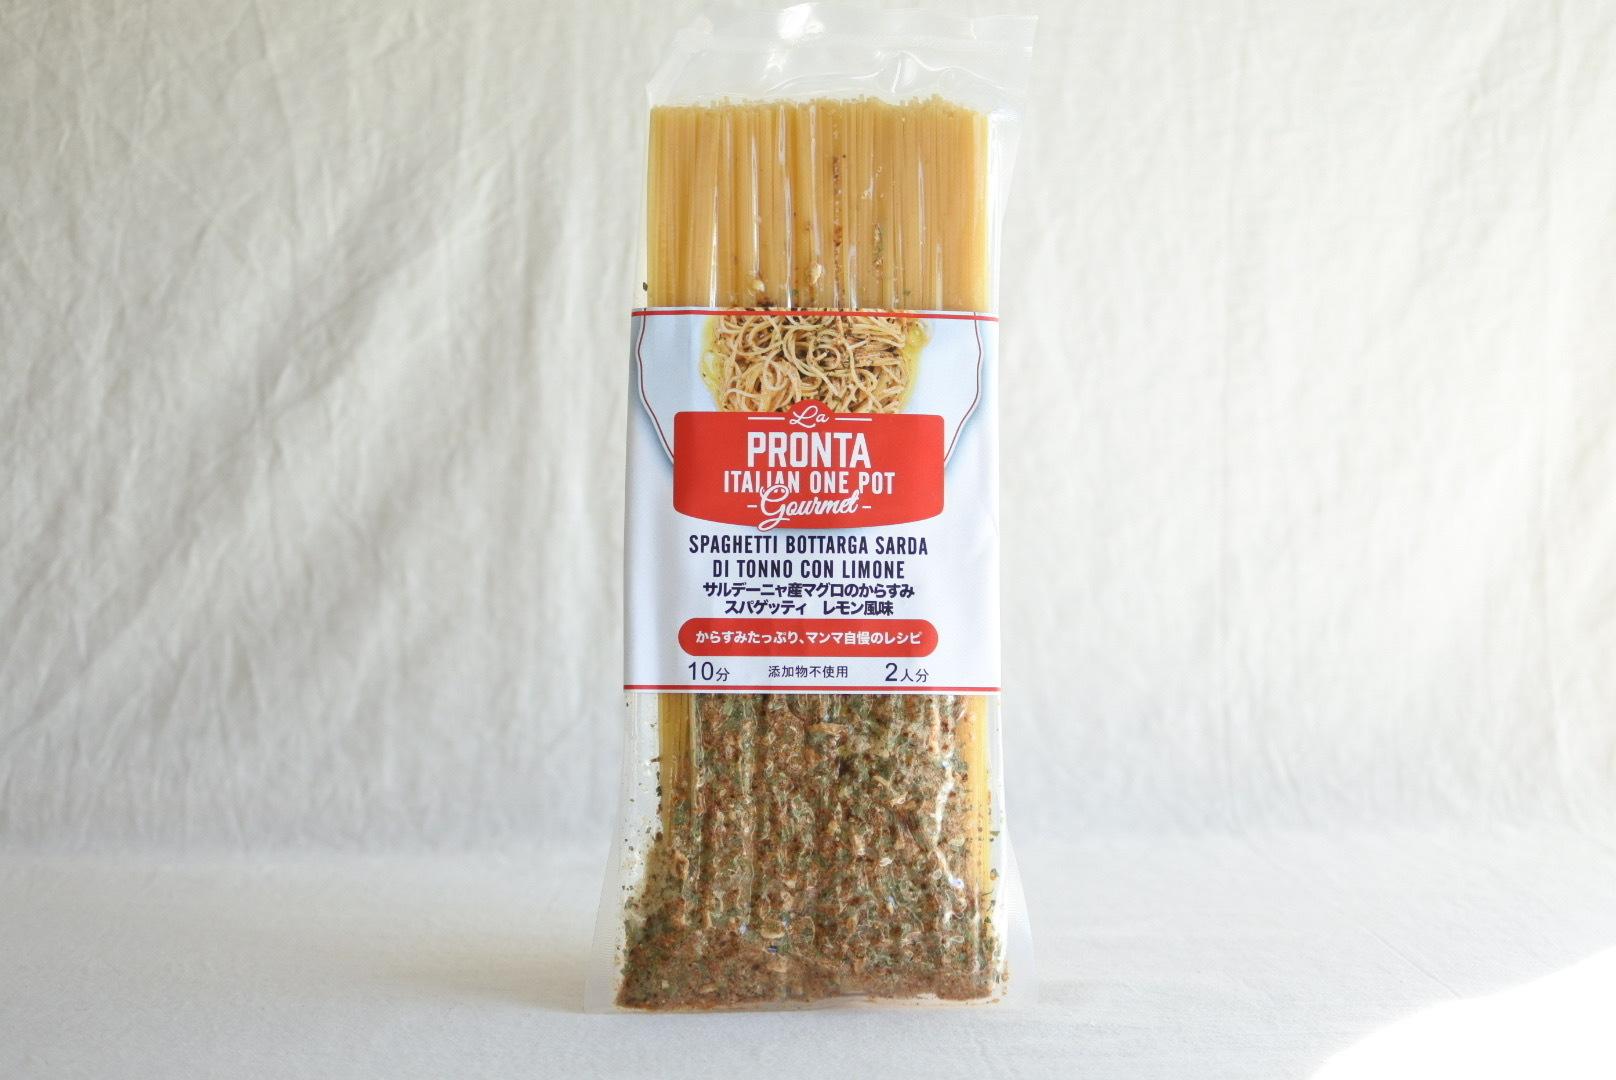 La Pronta サルディーニャ産マグロのからすみ味スパゲティ レモン風味